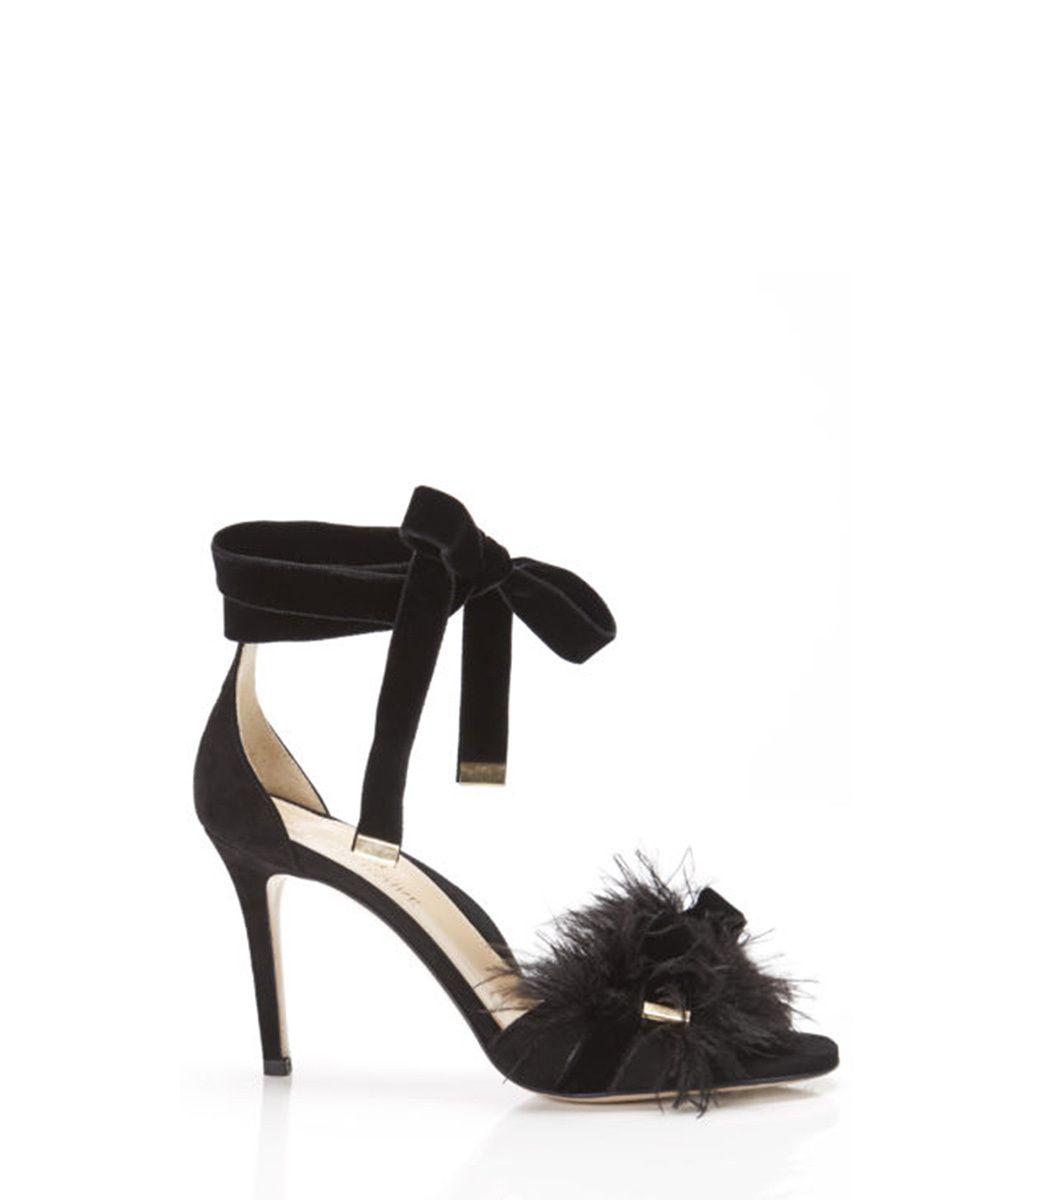 5b140810380 MARION-PARKE Lainey Sandal in Black. #marion-parke #shoes # | Marion ...